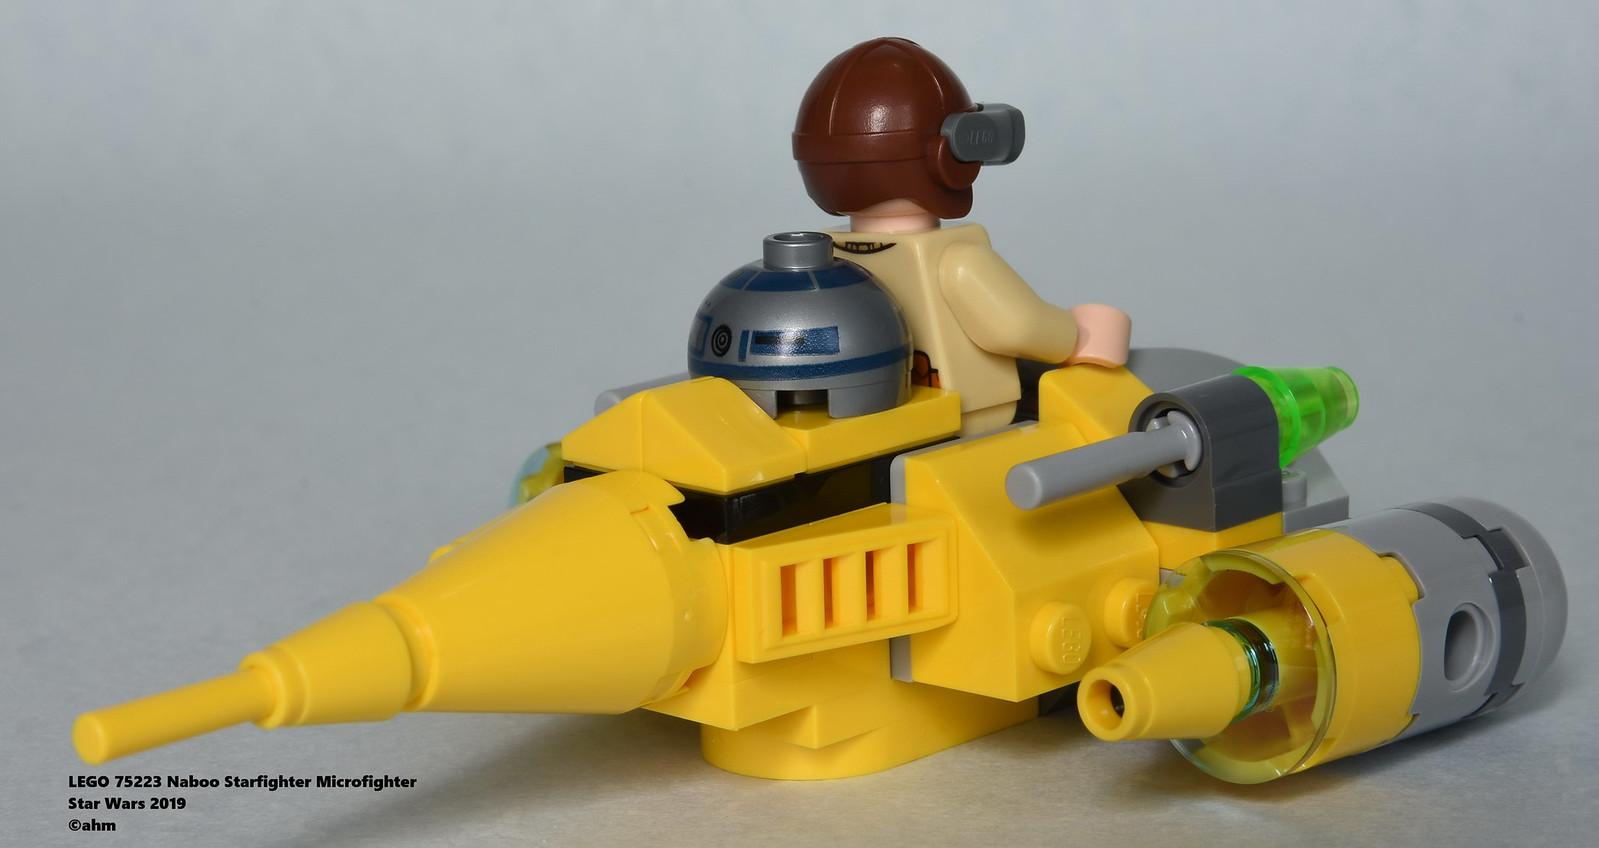 Star Wars Lego 75223 Naboo Starfighter Microfighter Flickr